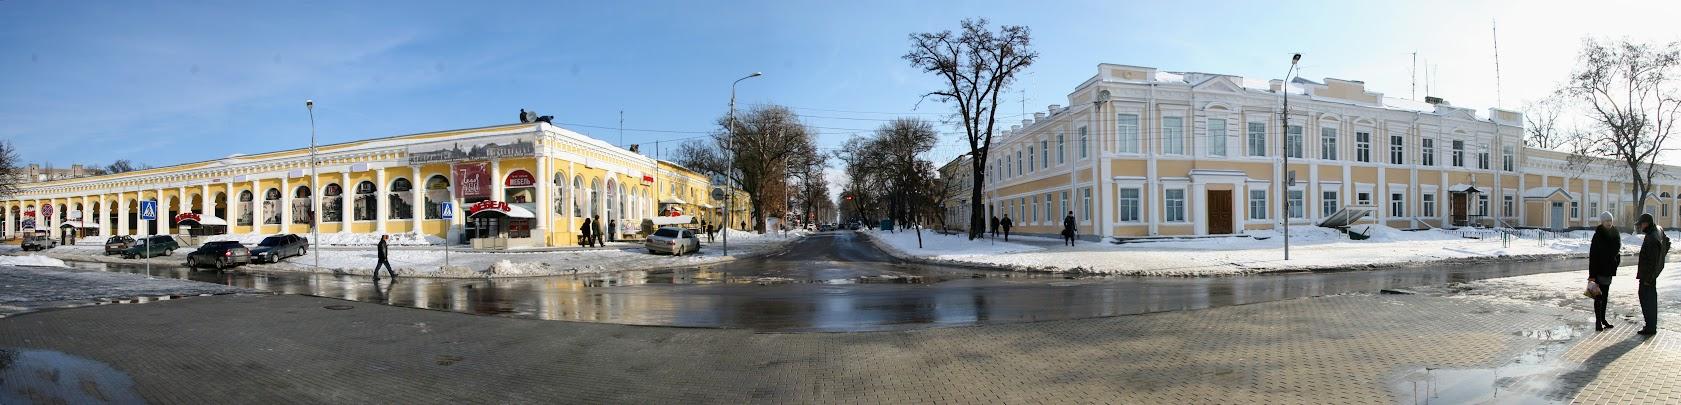 https://sites.google.com/site/istoriceskijtaganrog/cehova-ulica/gostinyj-dvor